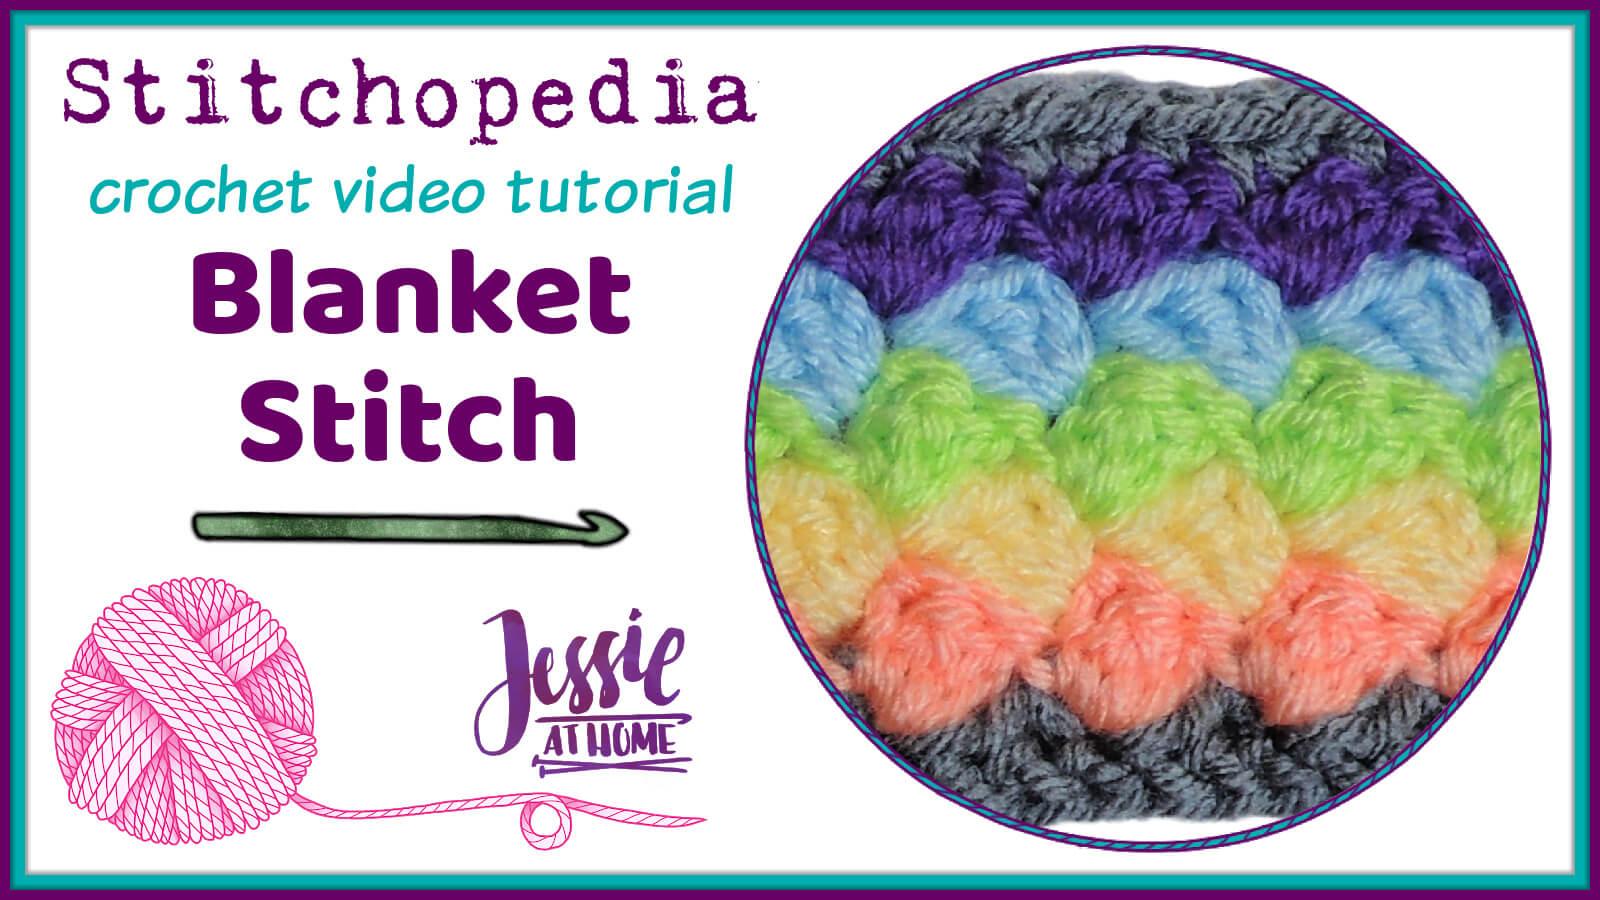 Blanket Stitch Stitchopedia Crochet Video Tutorial - Cover